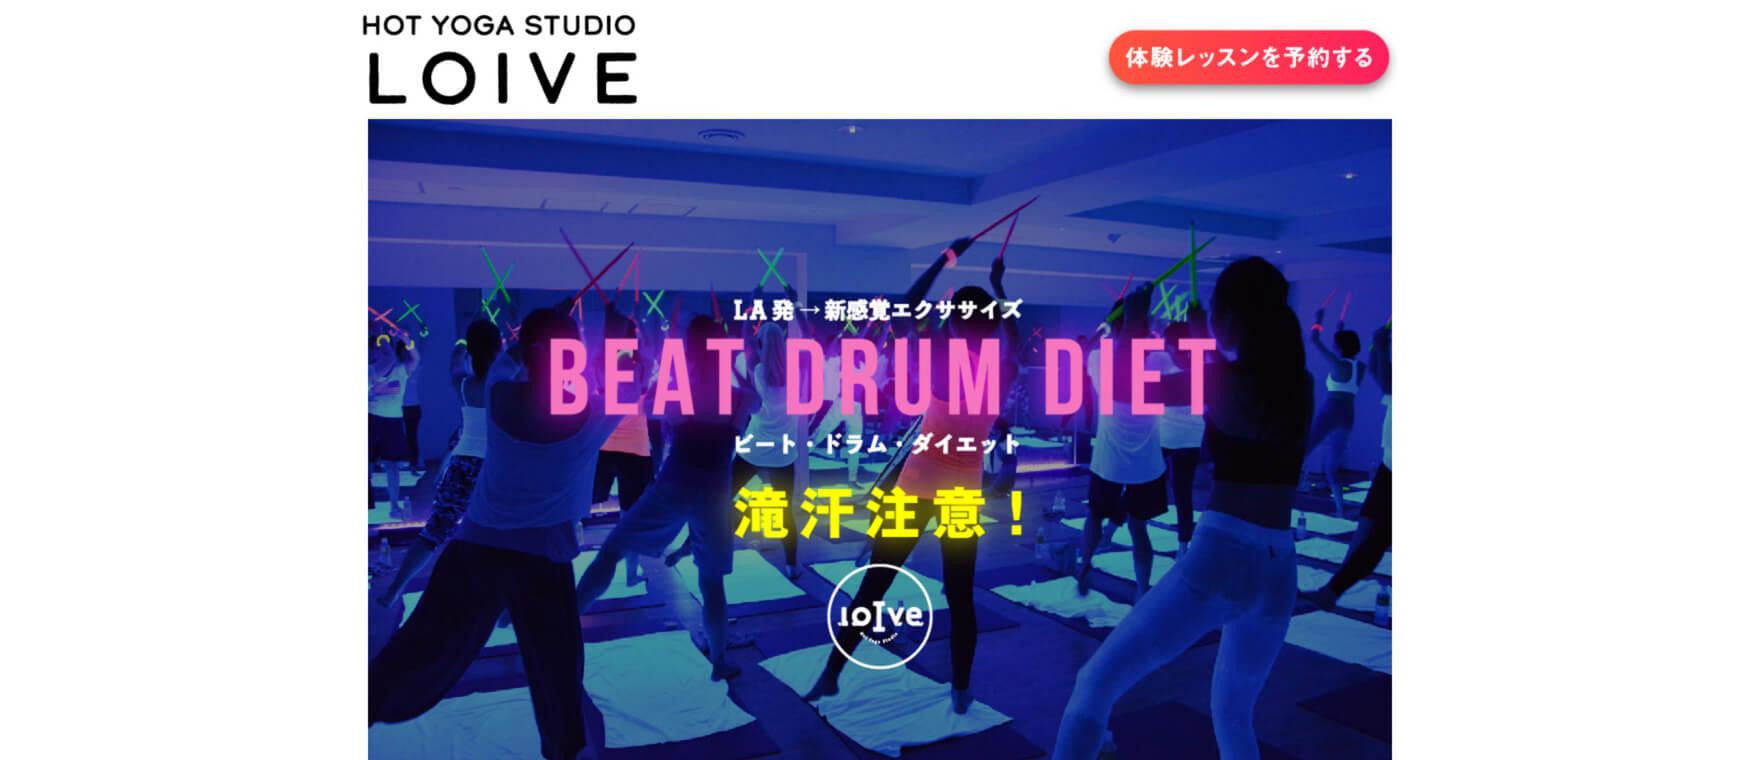 loIve京都四条店のイメージ画像